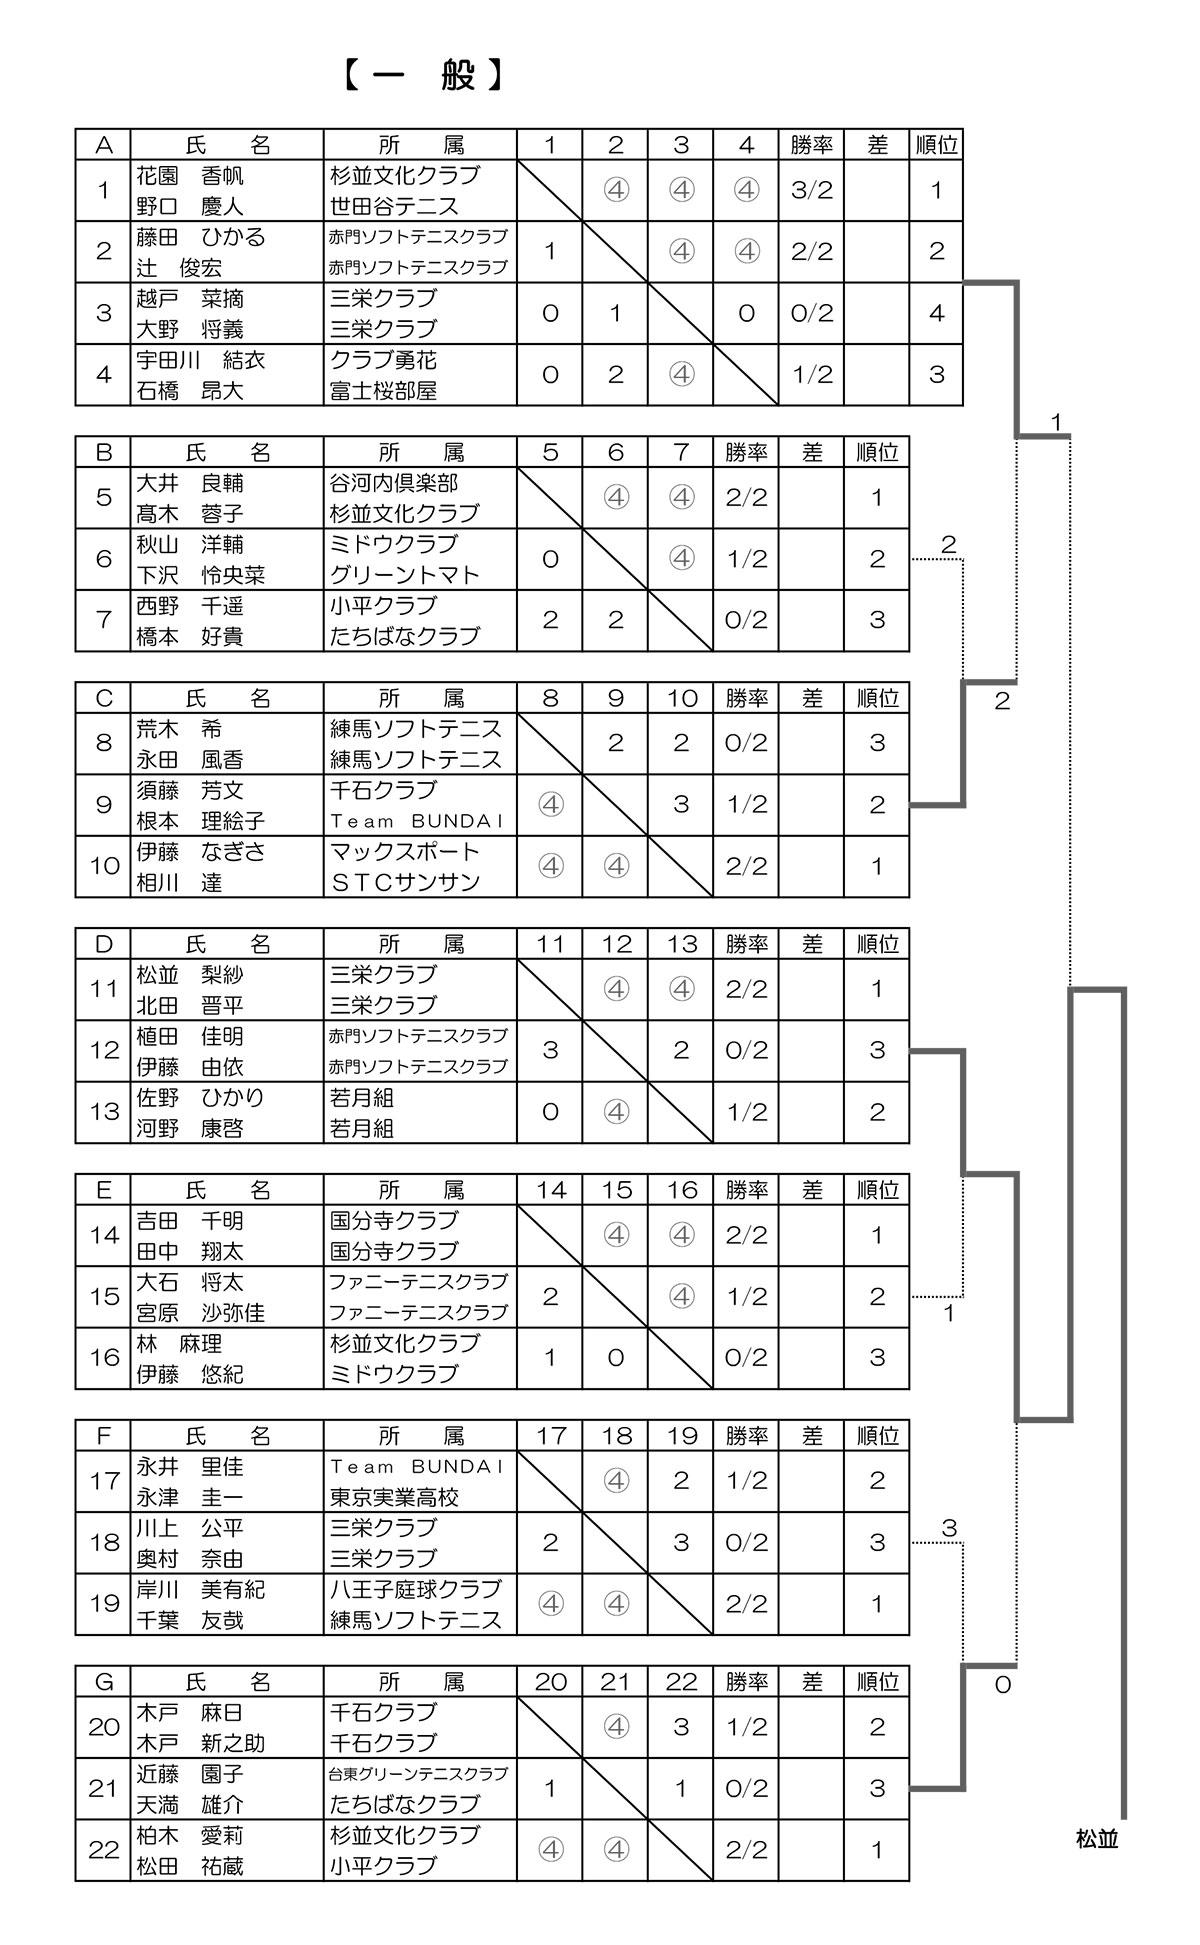 令和元年度 東京ミックス大会結果